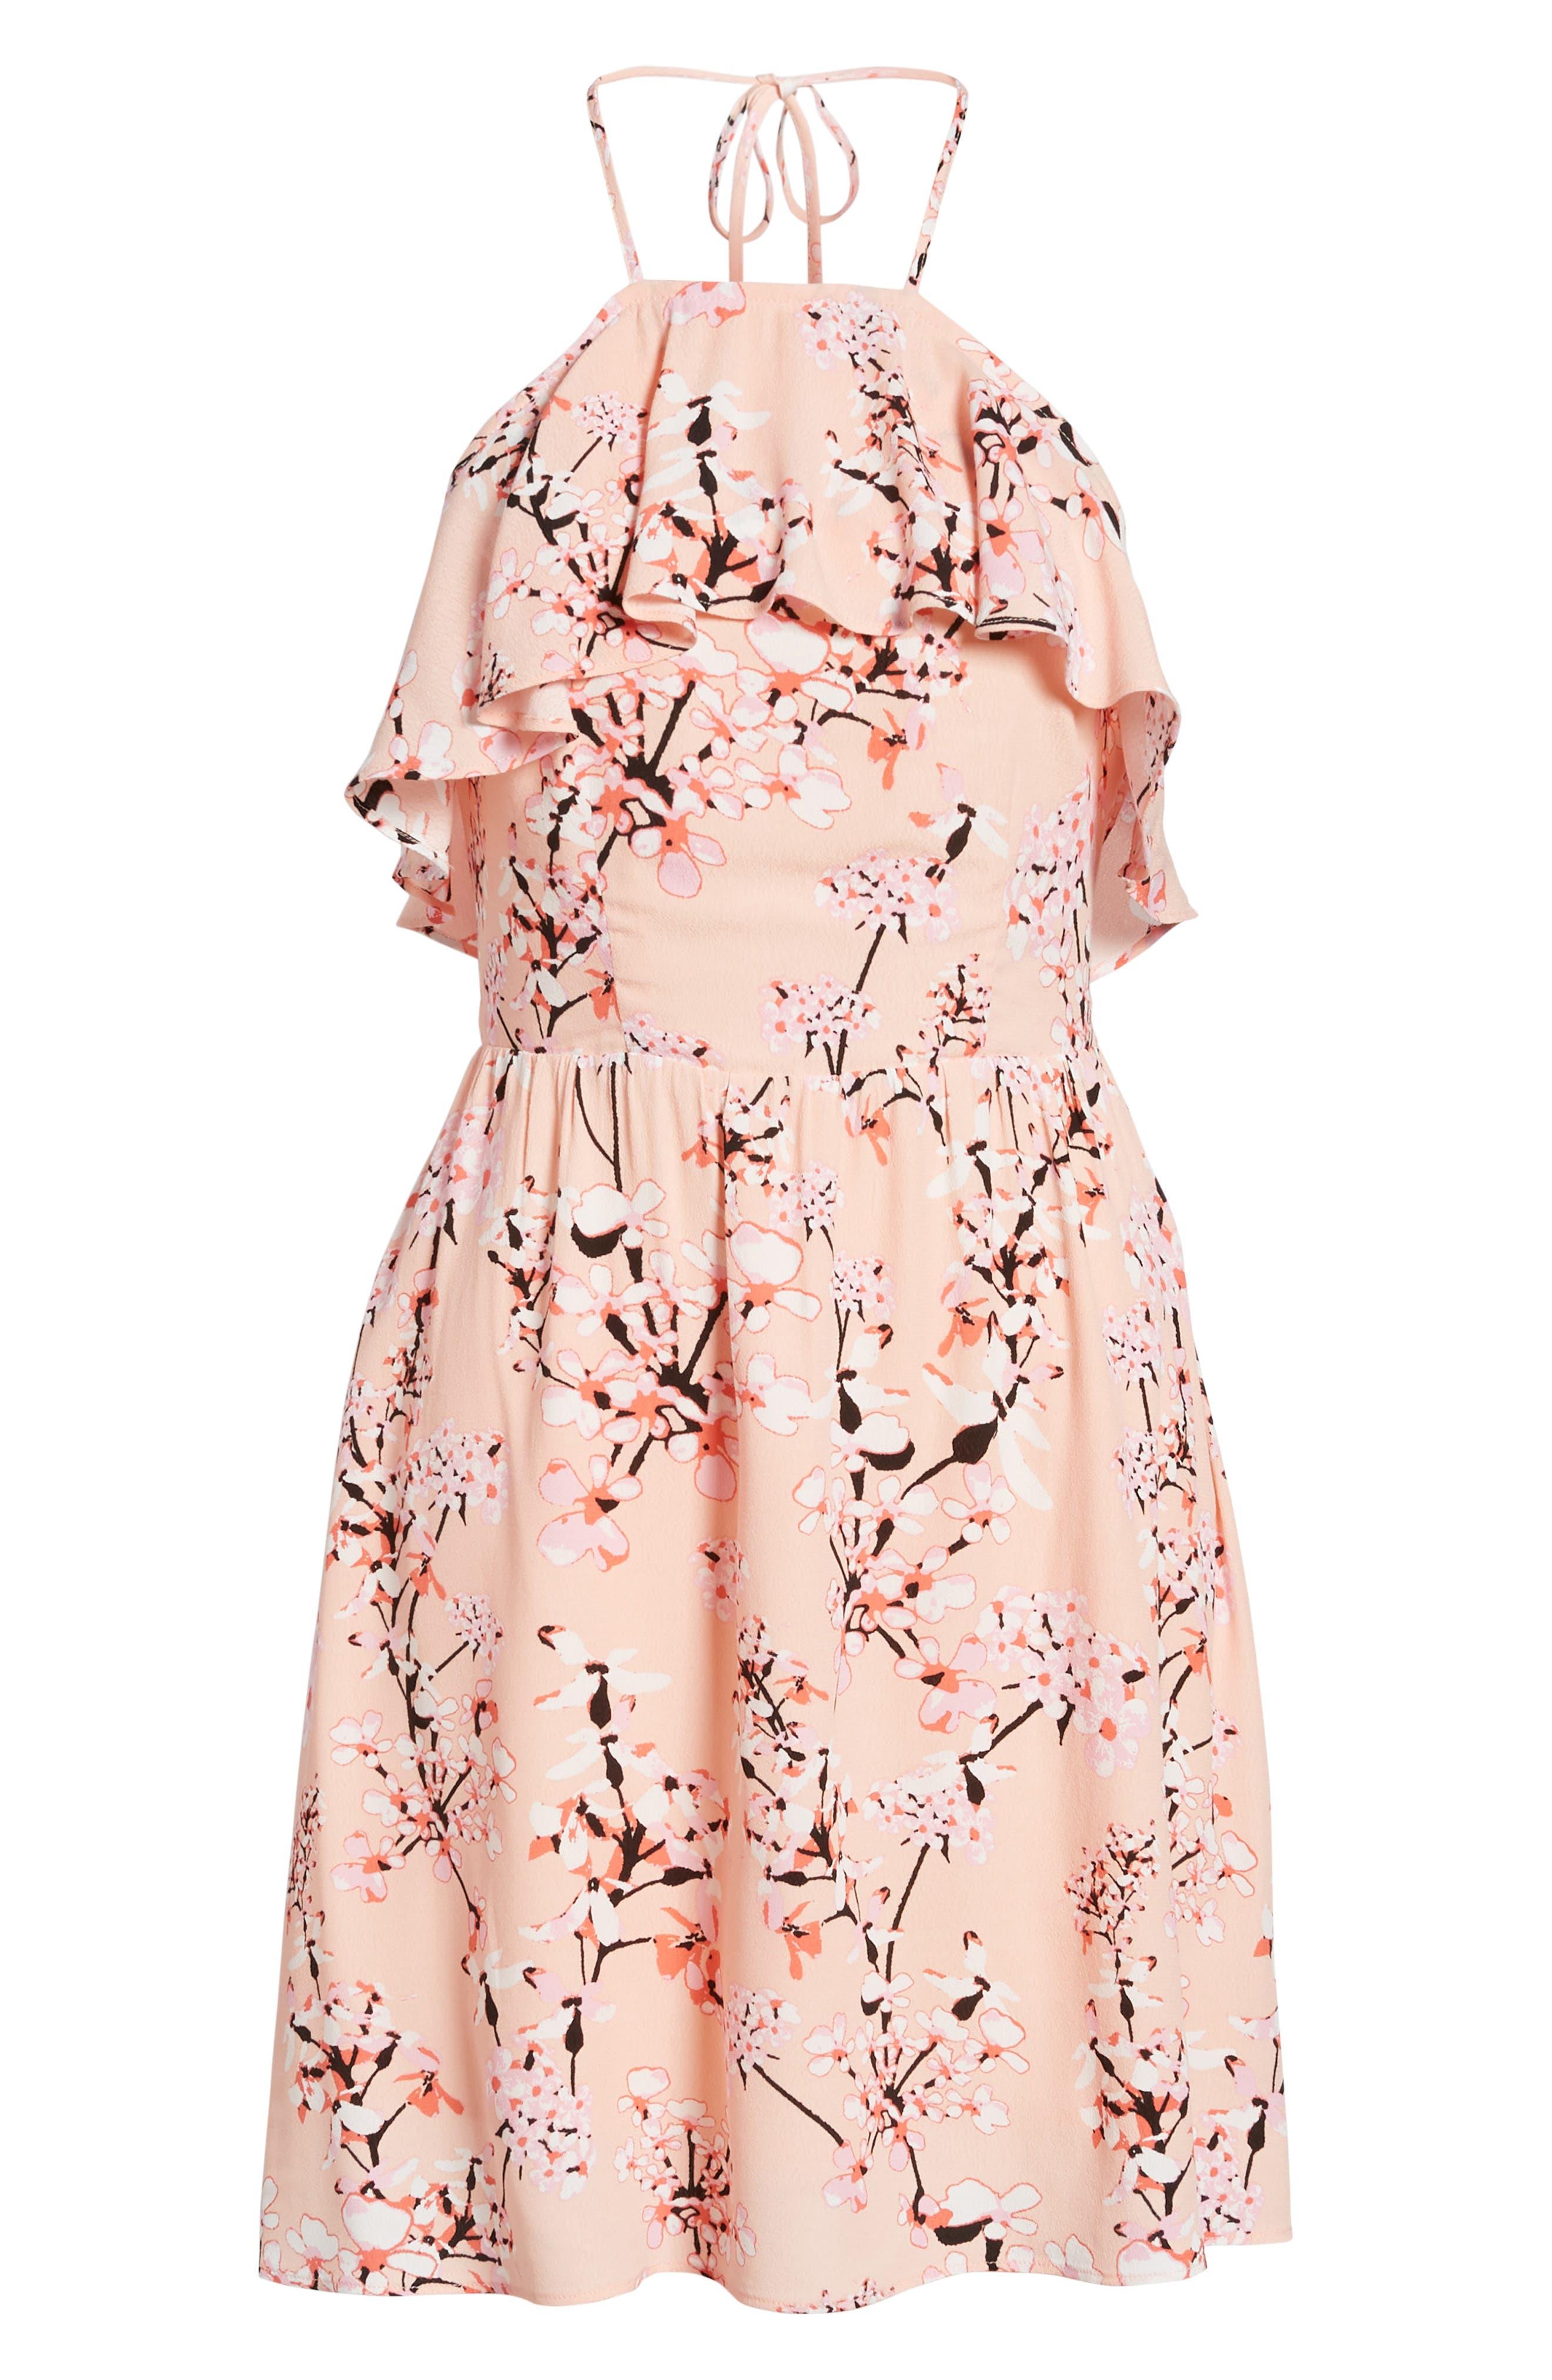 Corralyn Floral Print Halter Dress,                             Alternate thumbnail 6, color,                             PEACH PARFAIT